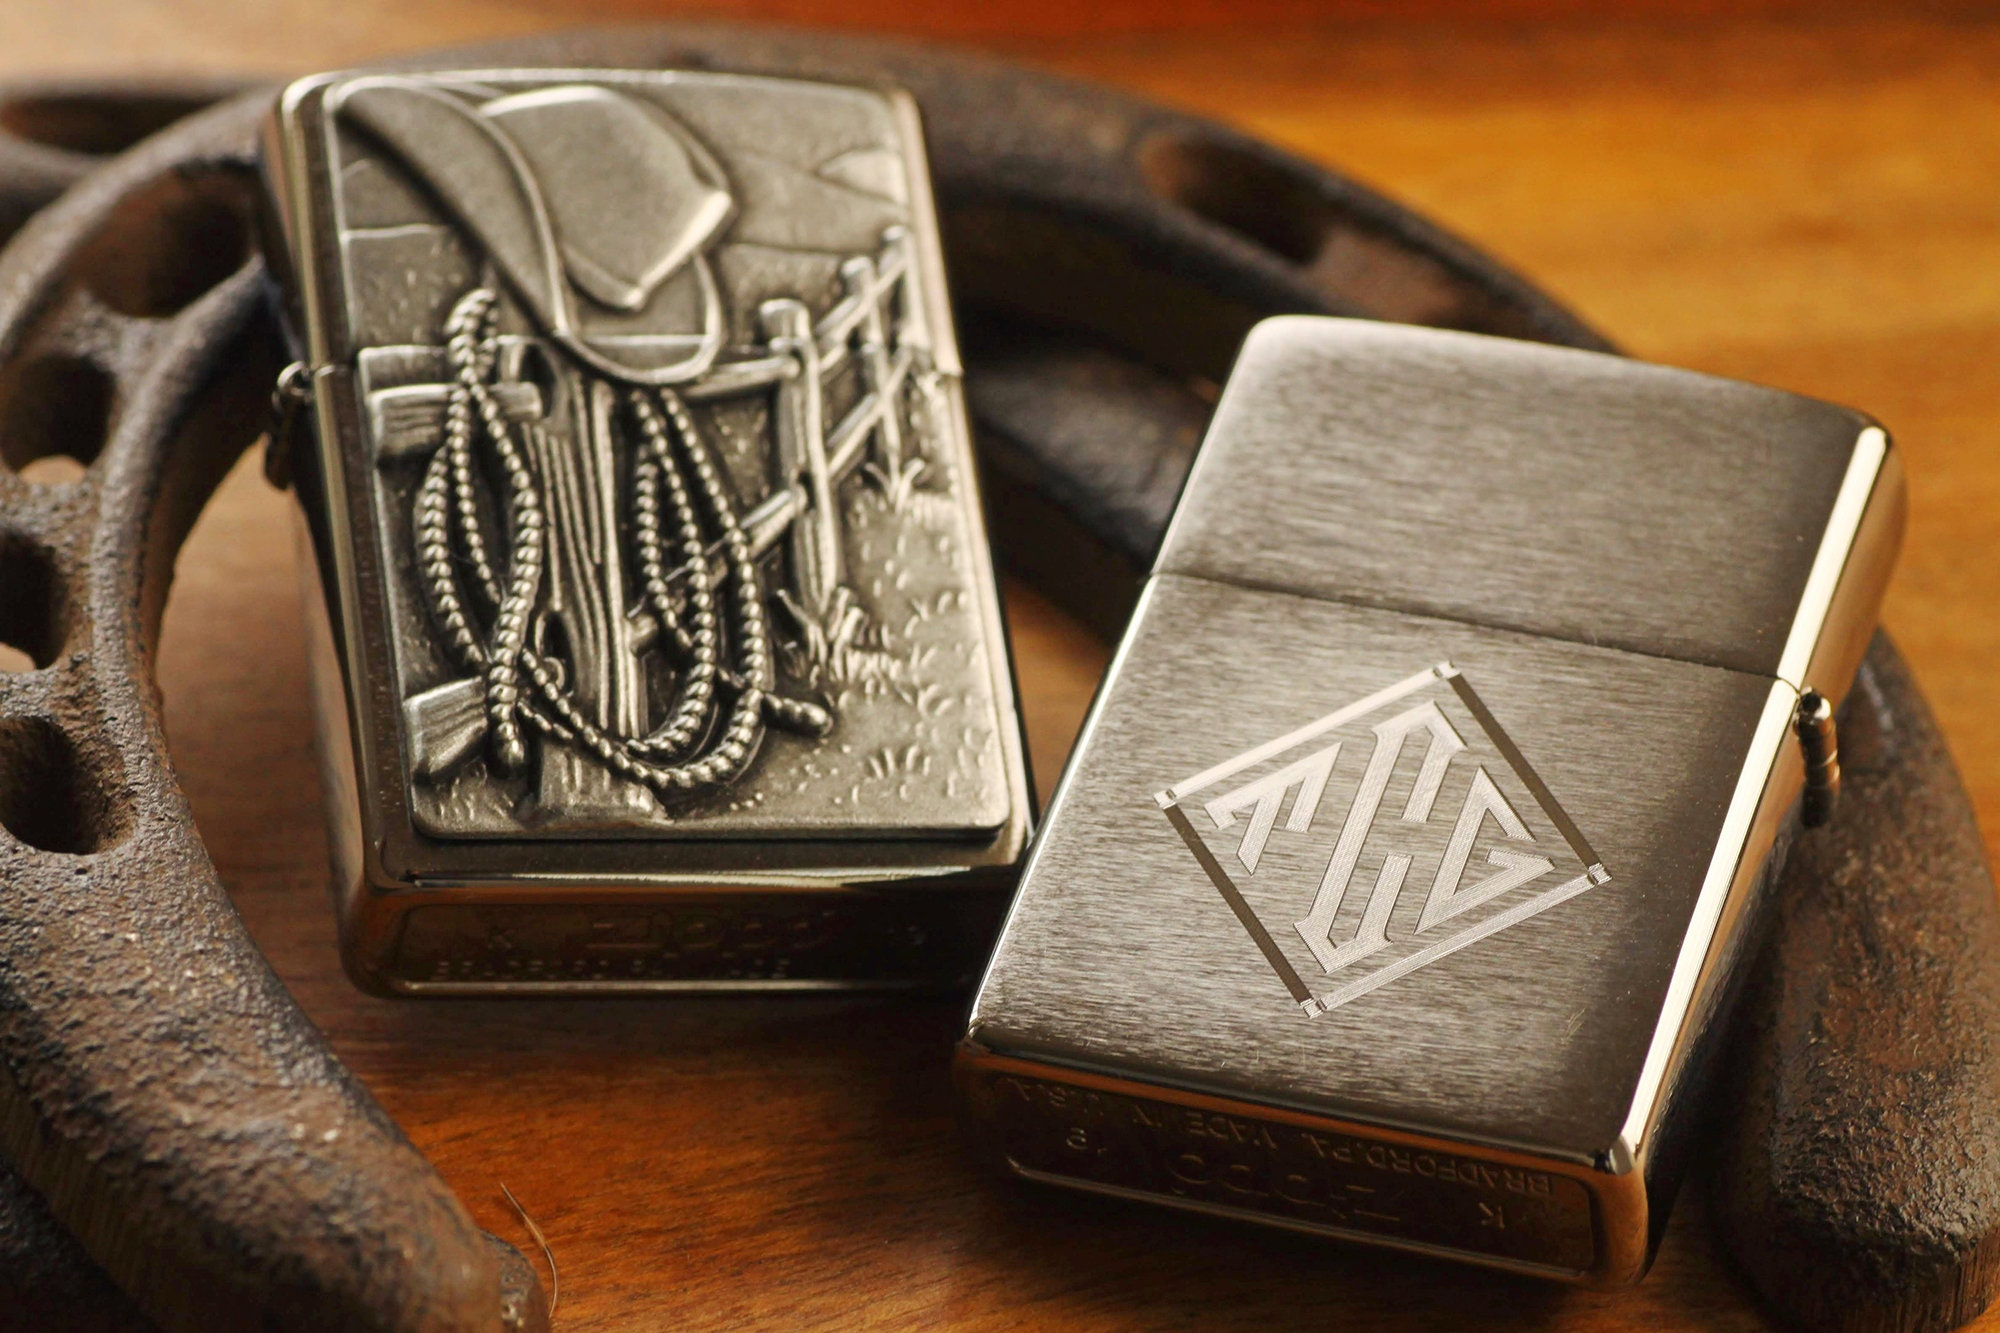 Cowboy Zippo© Lighter - Rodeo Lighter - Resting Cowboy Zippo© - Western Lighters with Custom Monogram Engraving